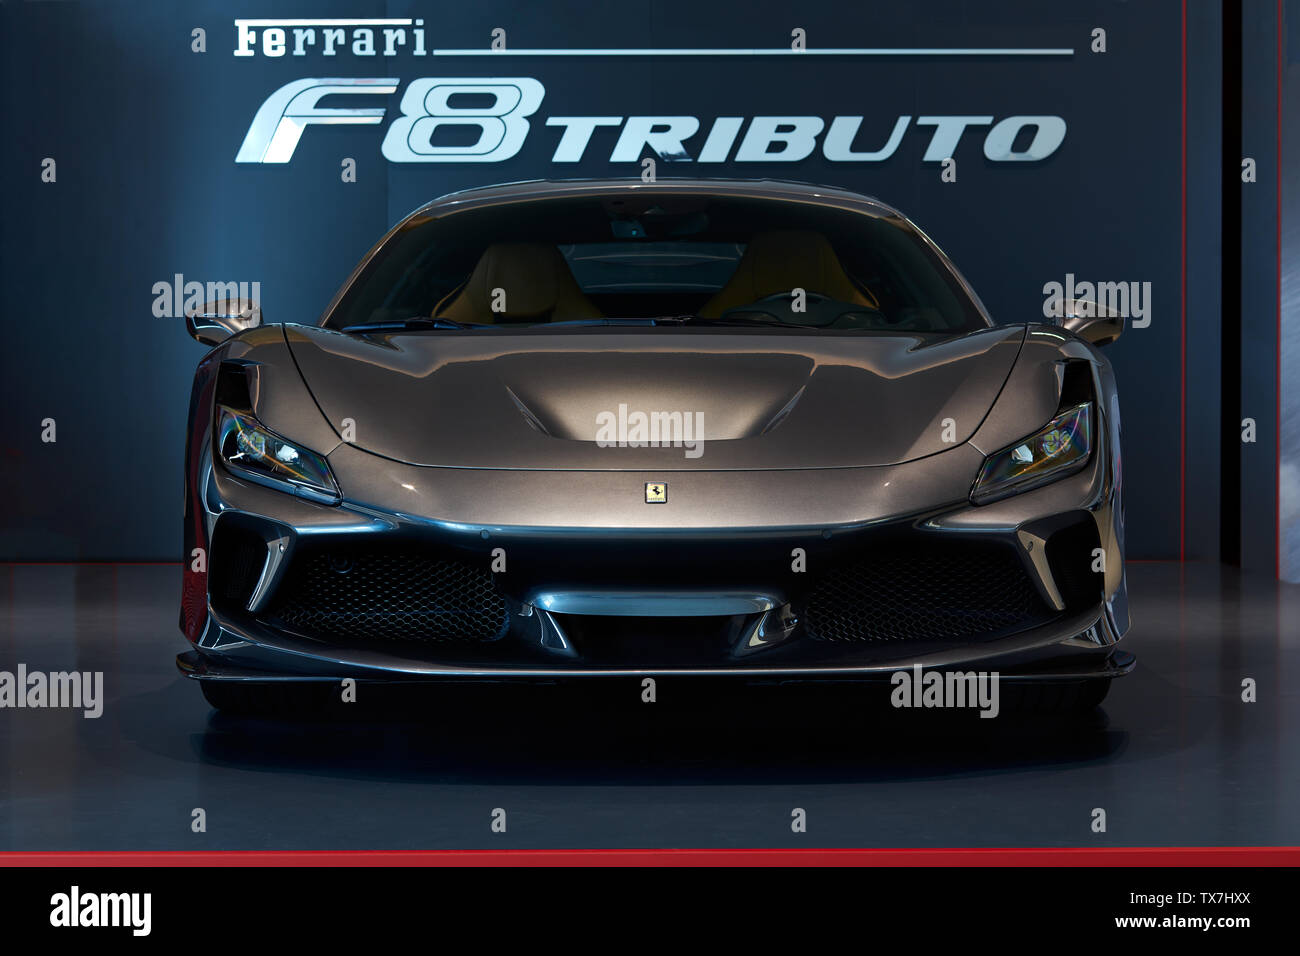 Katowice/Poland- 06.14.2019: Polish premier of Ferrari F8 Tributo - Stock Image